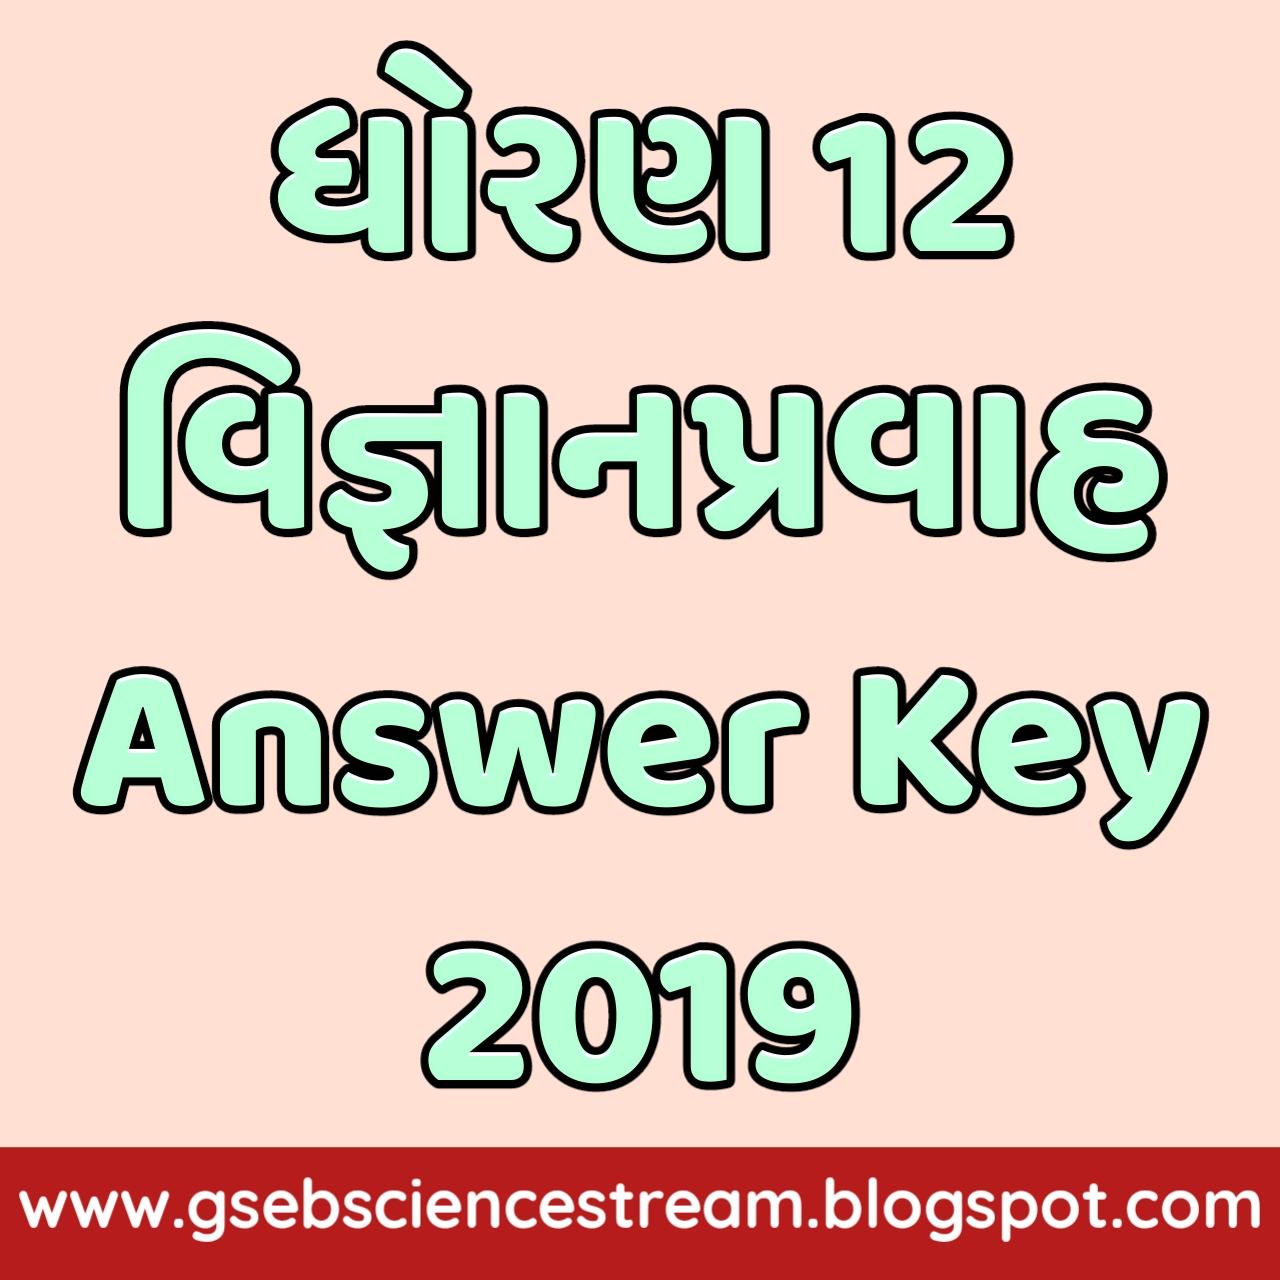 Std 12 Science Official Answer Key 2019 by Gujarat Board